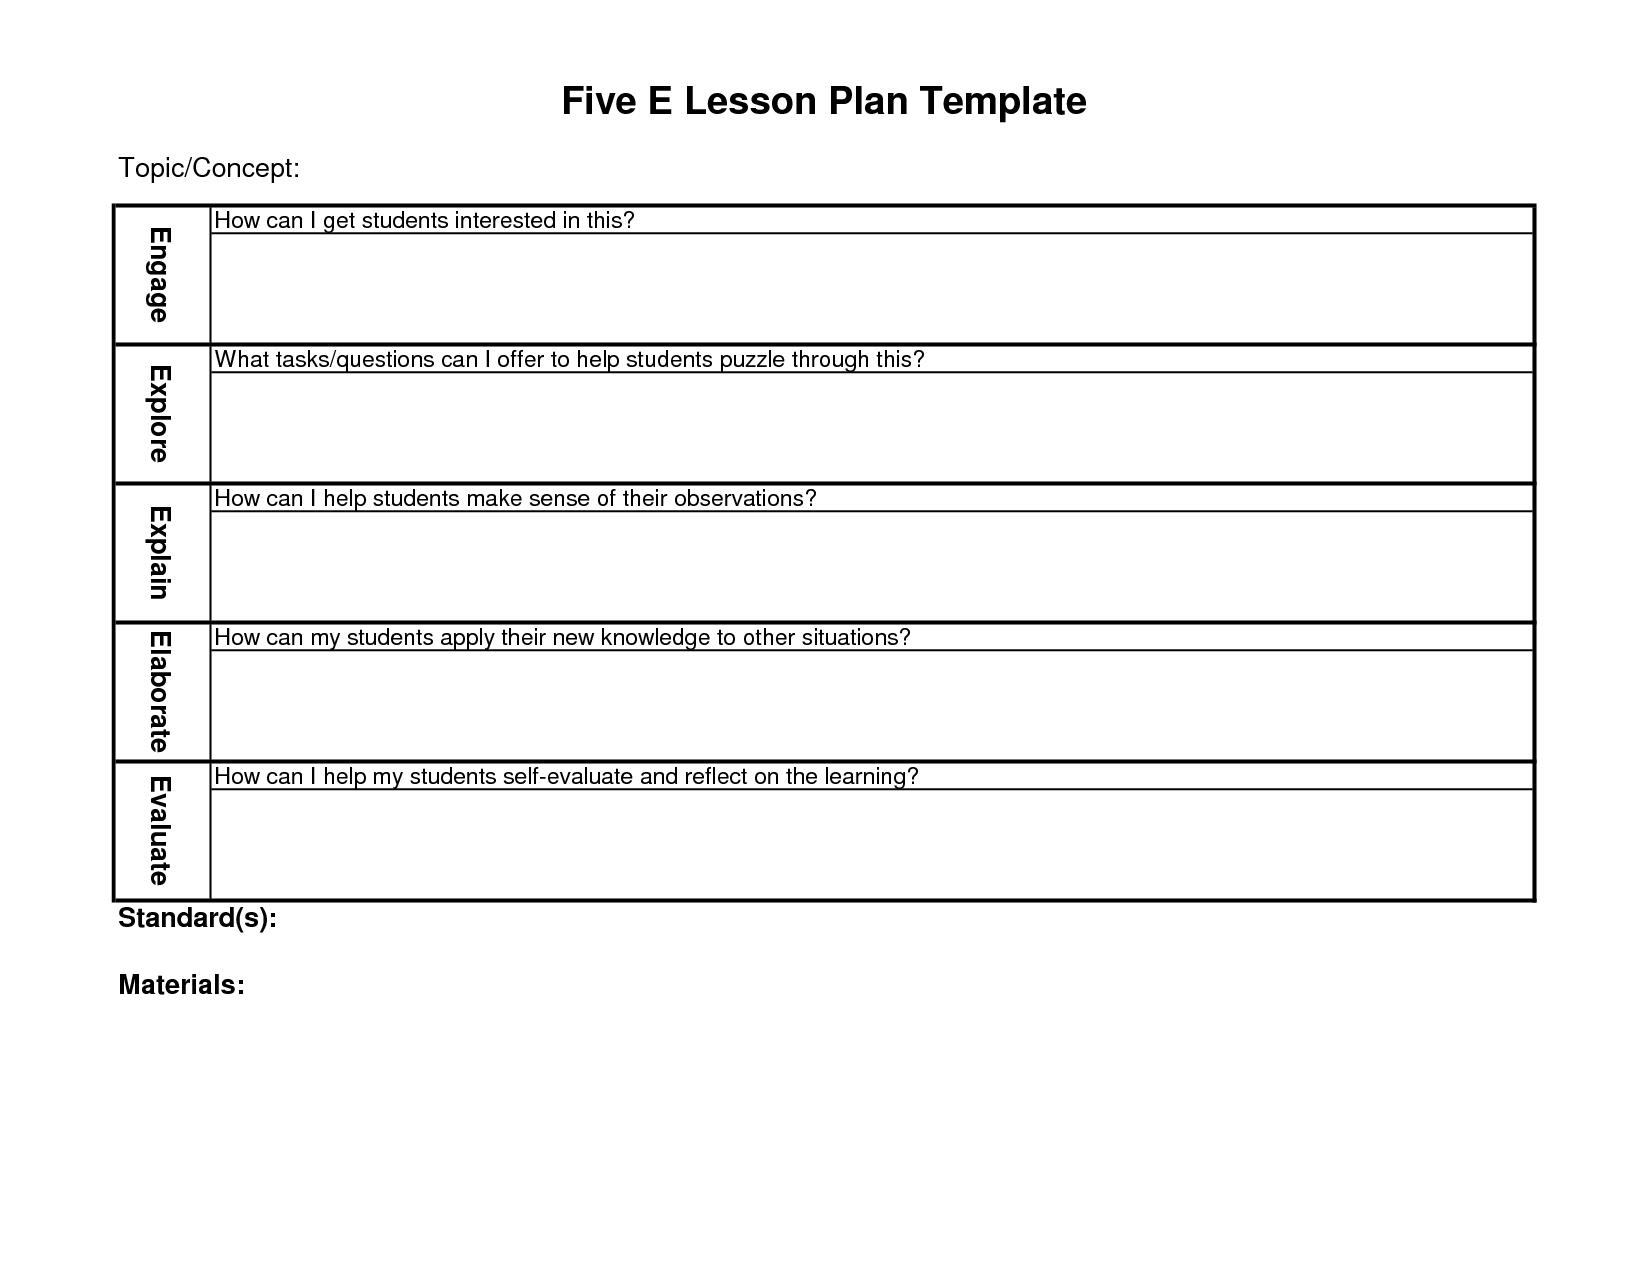 5 E Lesson Plan